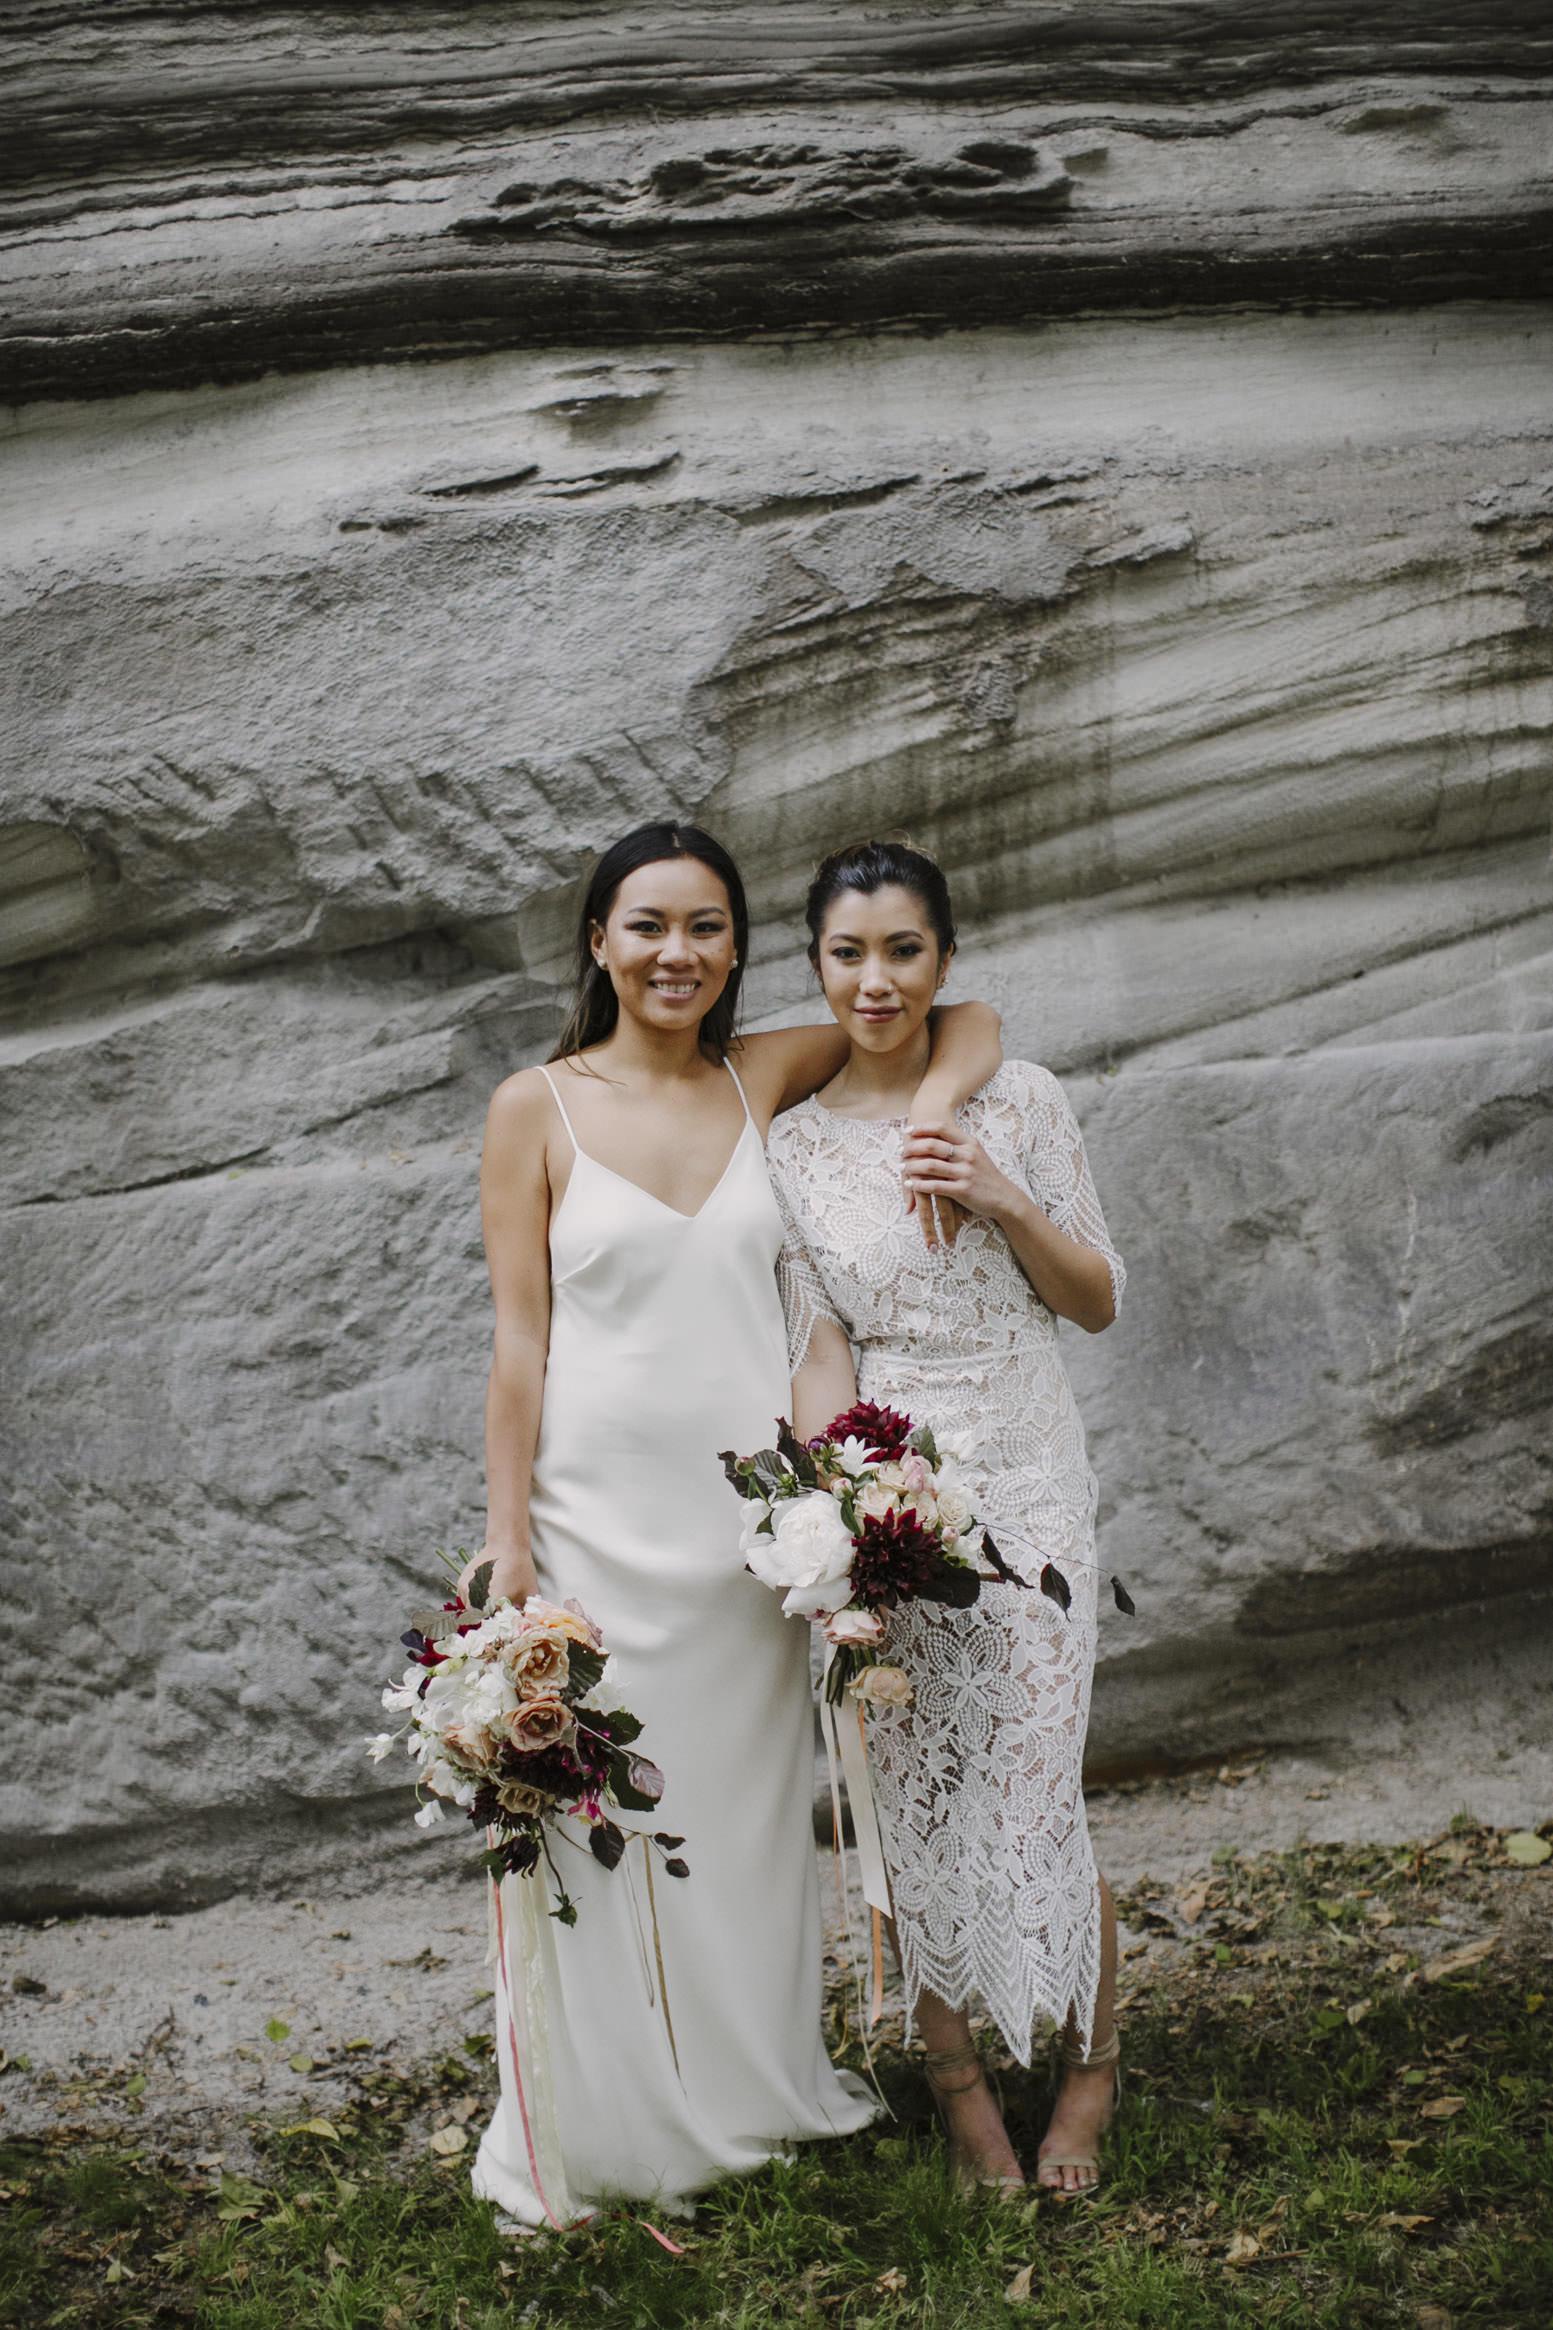 151122_justinaaron_wedding_anja_camilo_pr-118.jpg